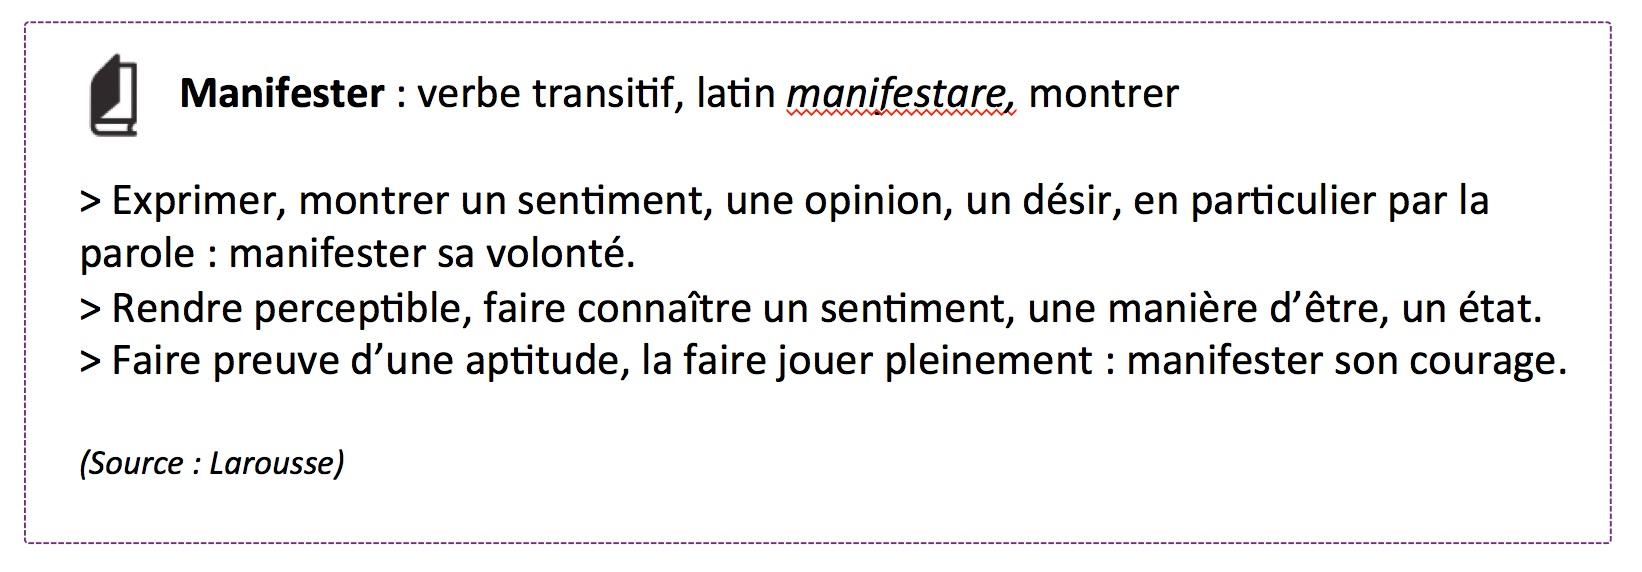 definition_manifeste